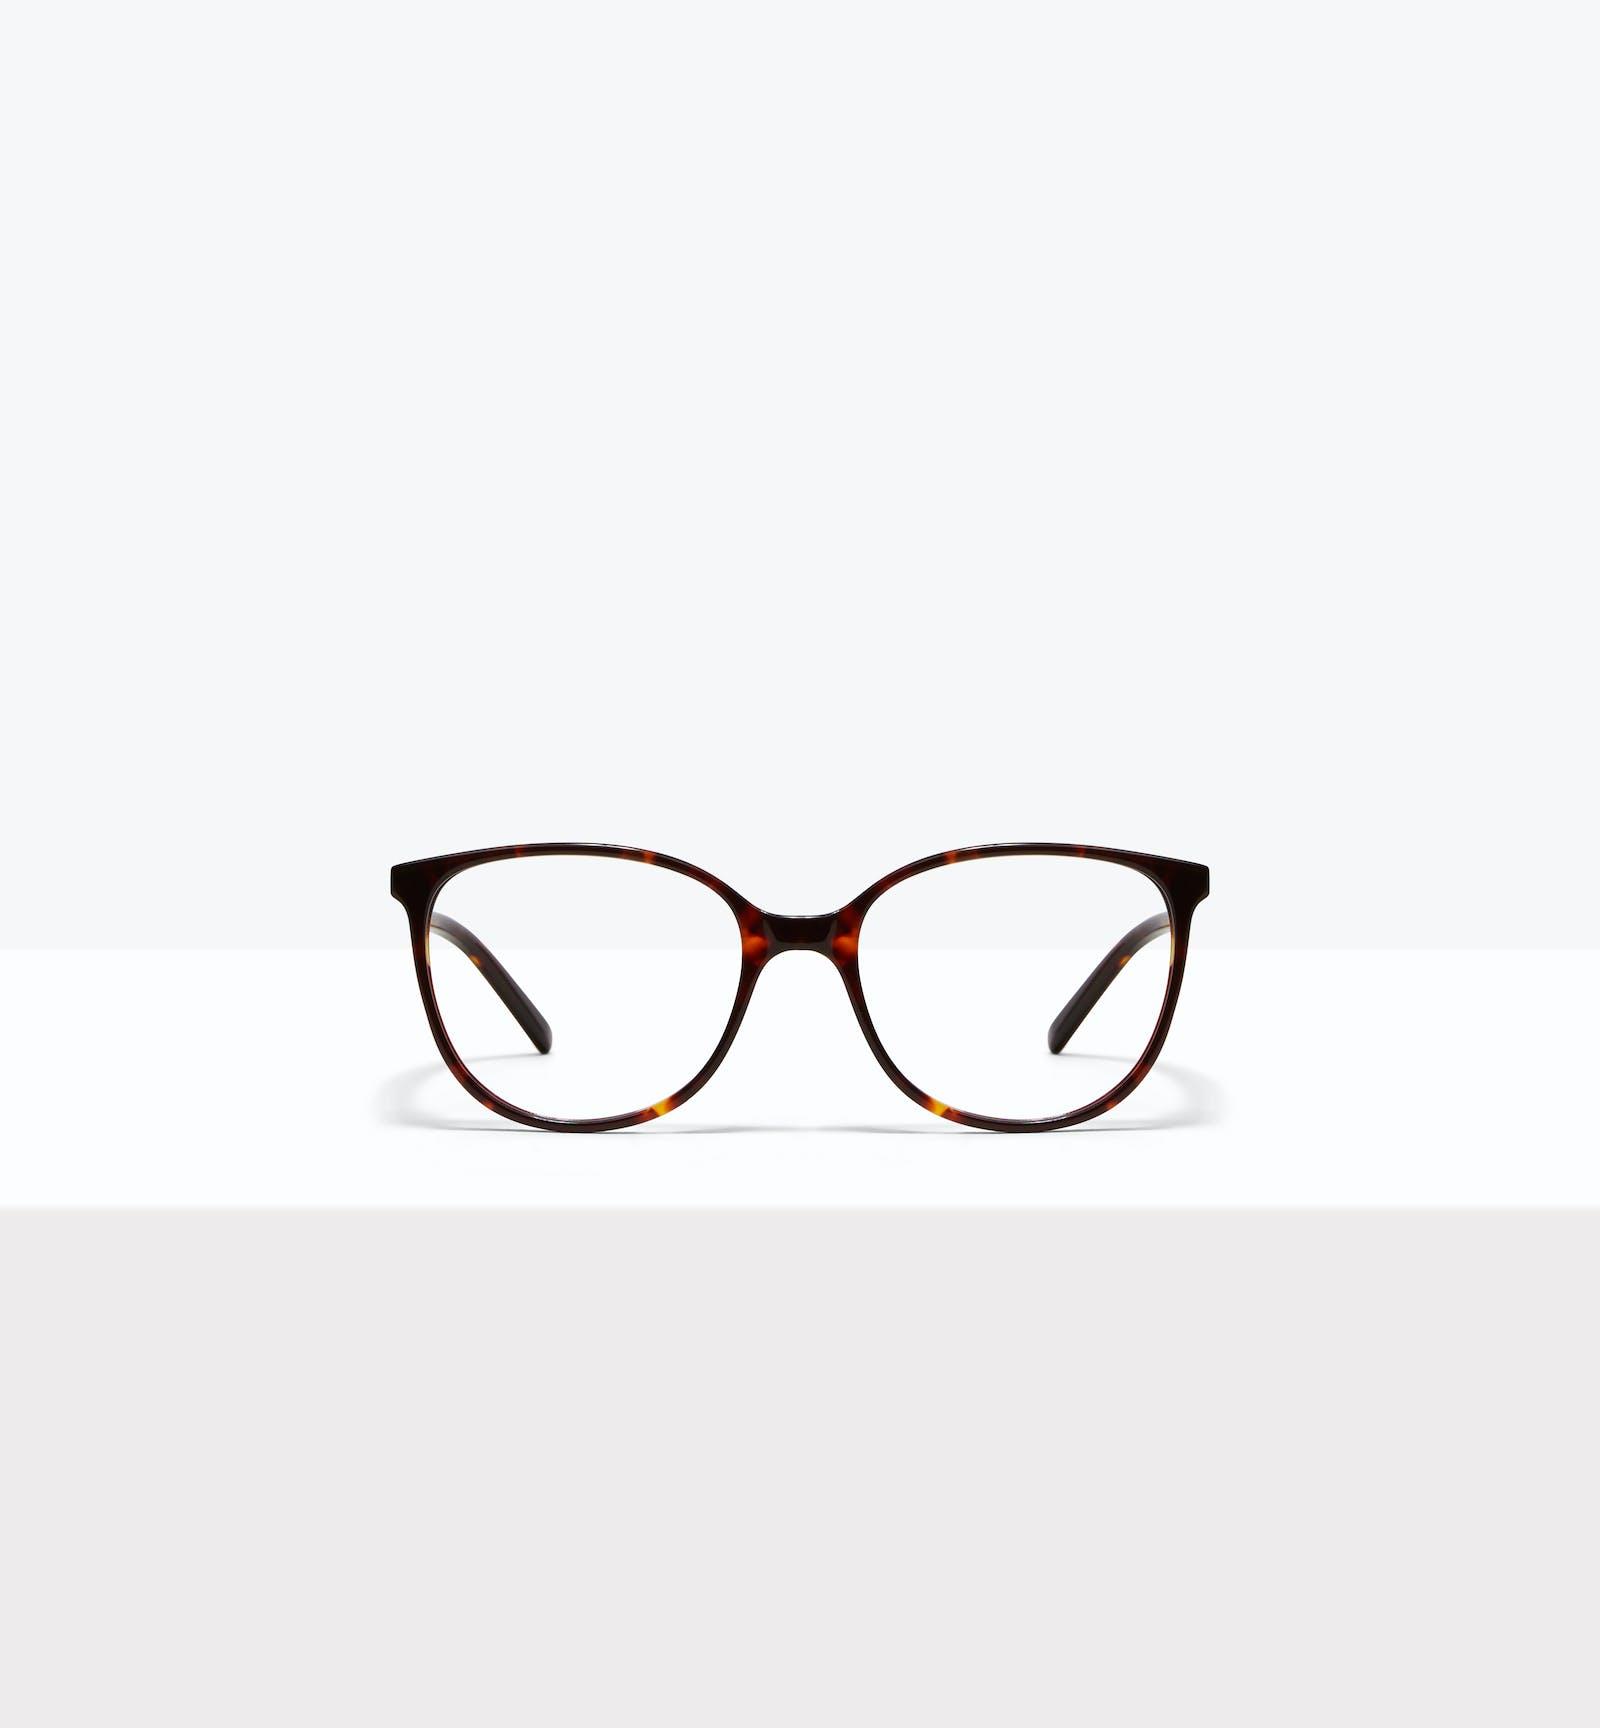 f3a6aa57a6 Affordable Fashion Glasses Round Eyeglasses Women Imagine Petite Sepia Kiss